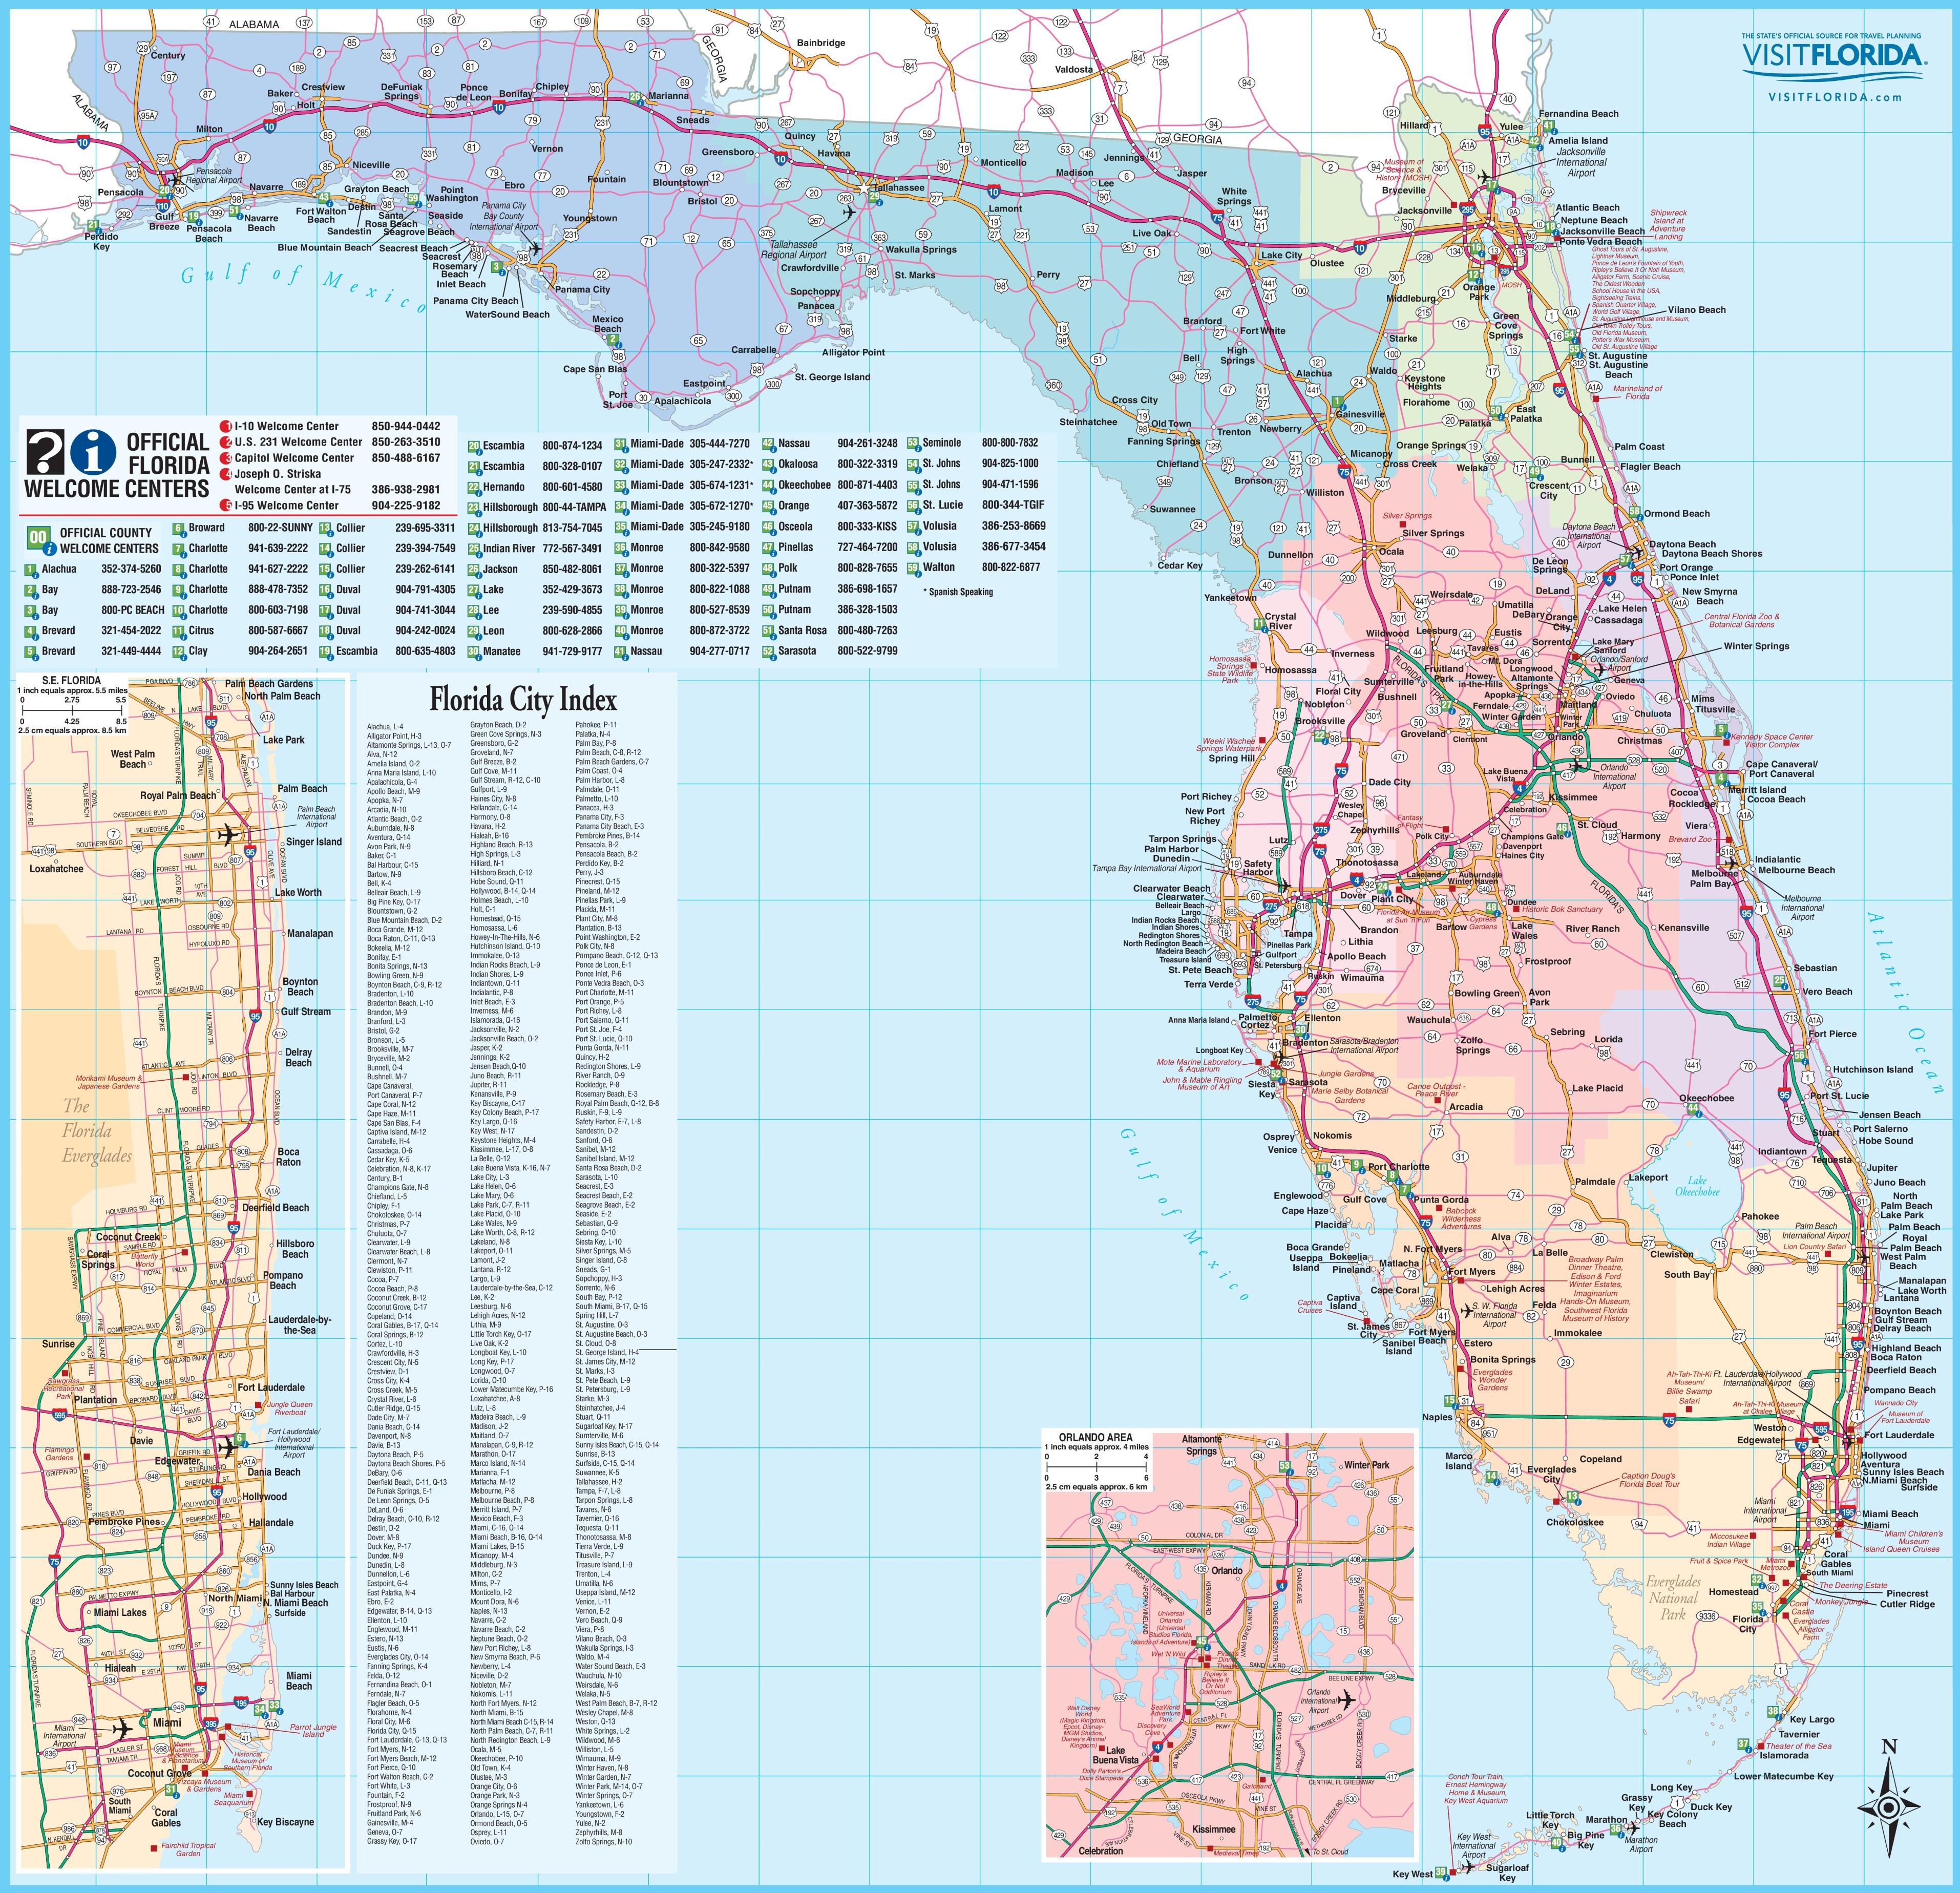 Map Of Florida From Ontheworldmap 6 - Ameliabd - Map Of S Florida